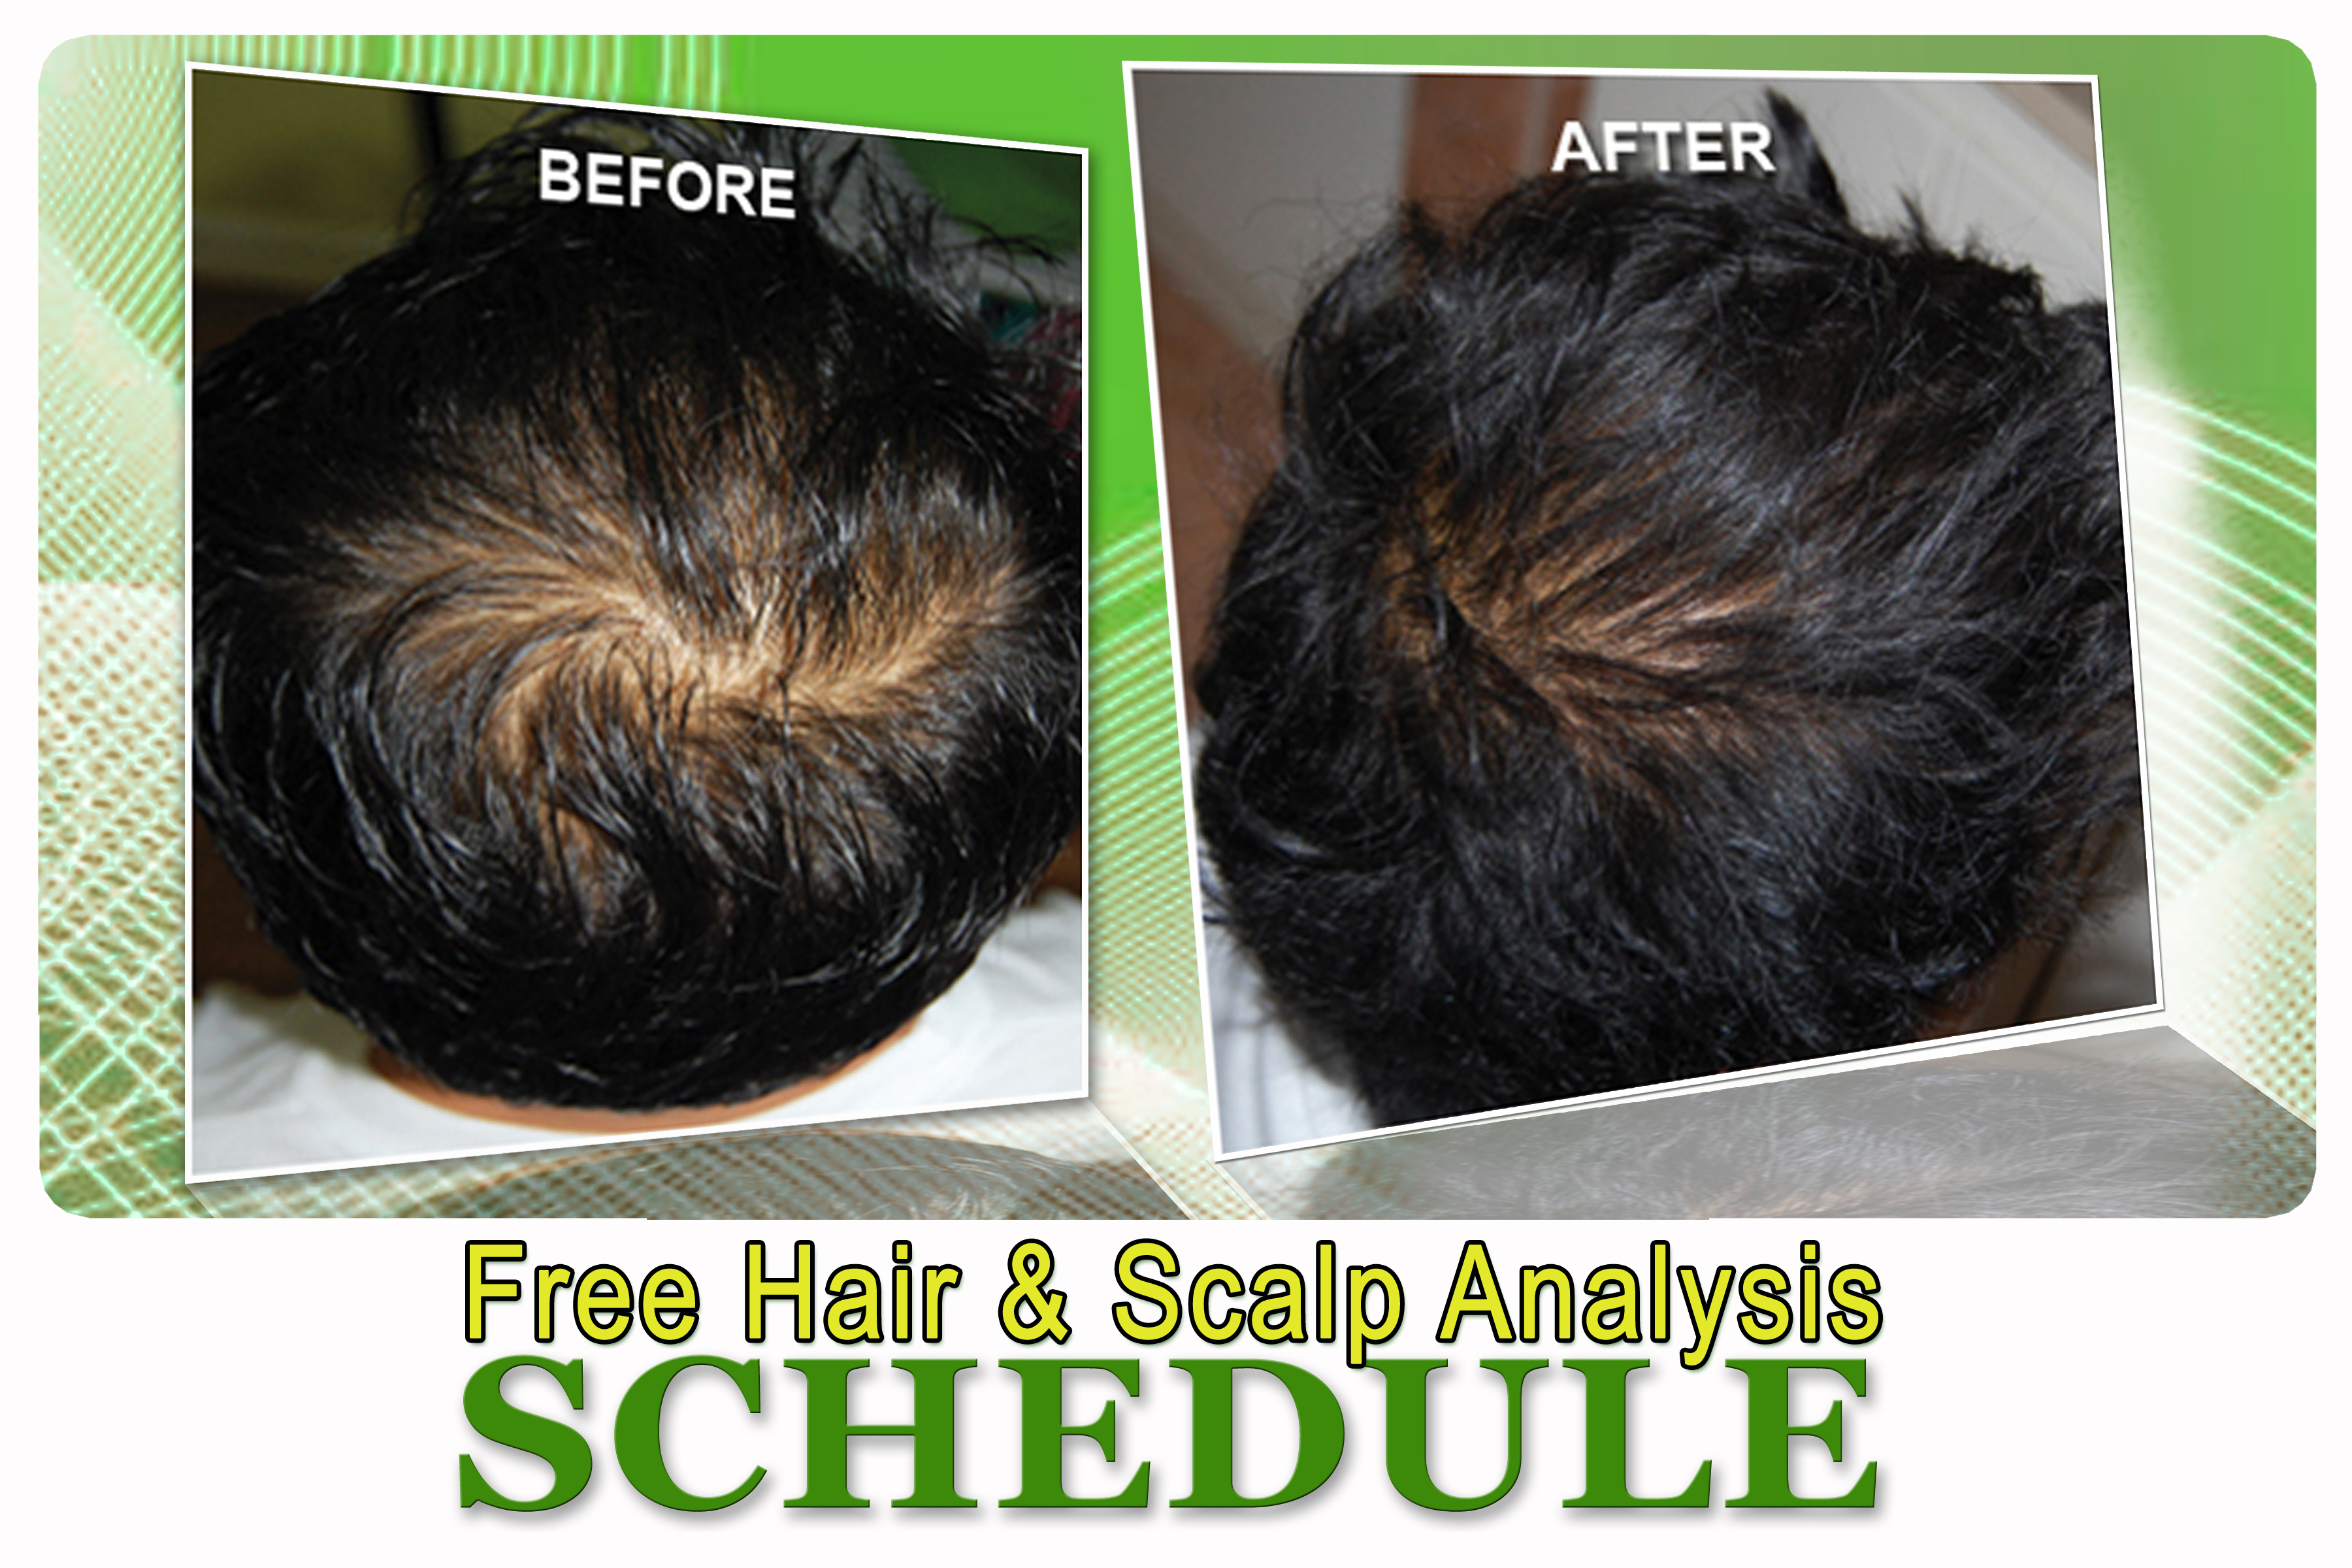 Novuhair Free Hair & Scalp Analysis